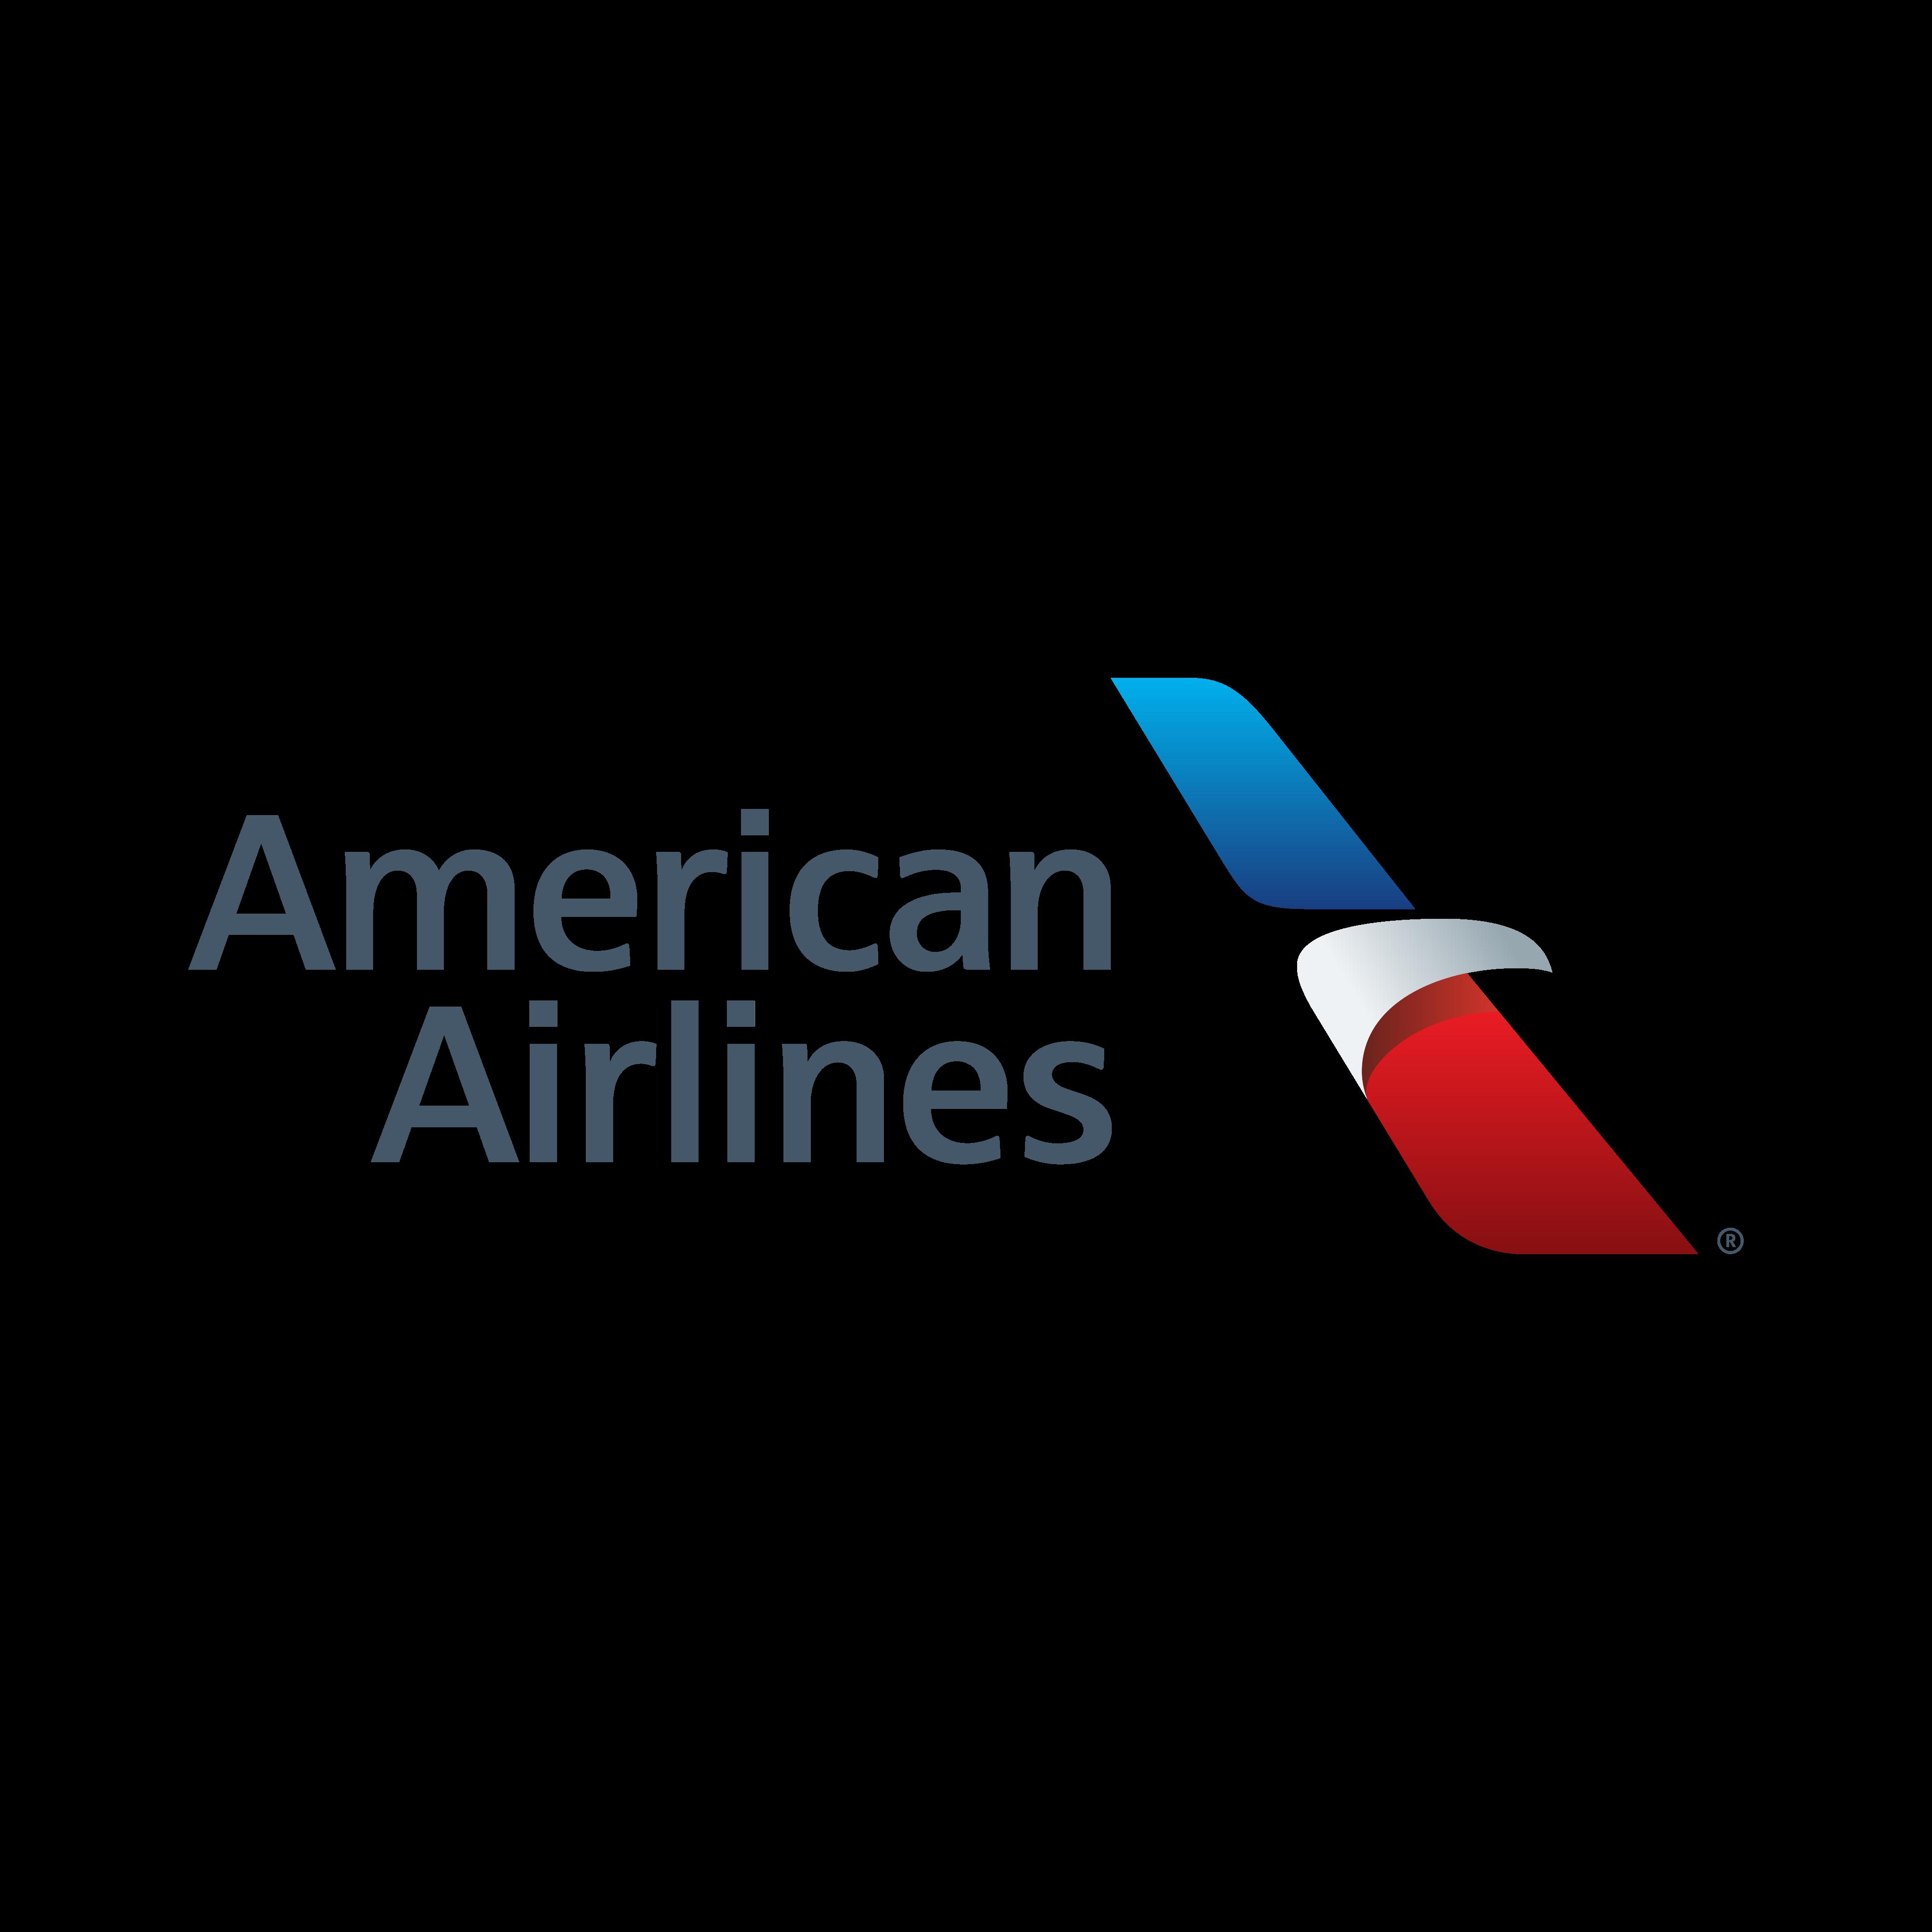 american airlines logo 0 - American Airlines Logo